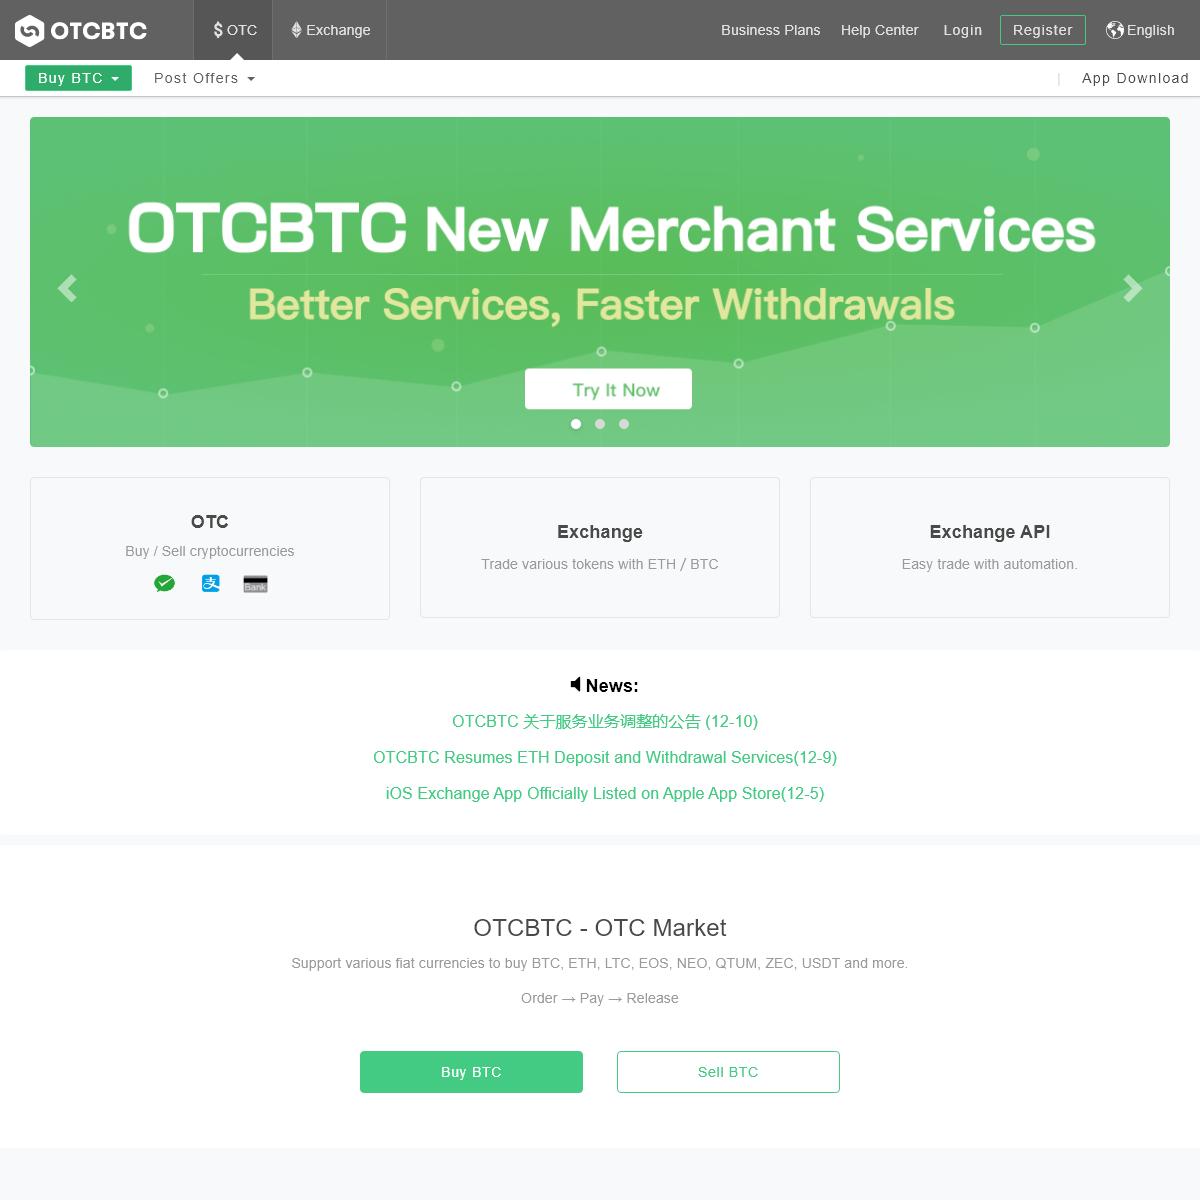 OTCBTC - Your most reliable and convenient crypto marketplace. - OTCBTC